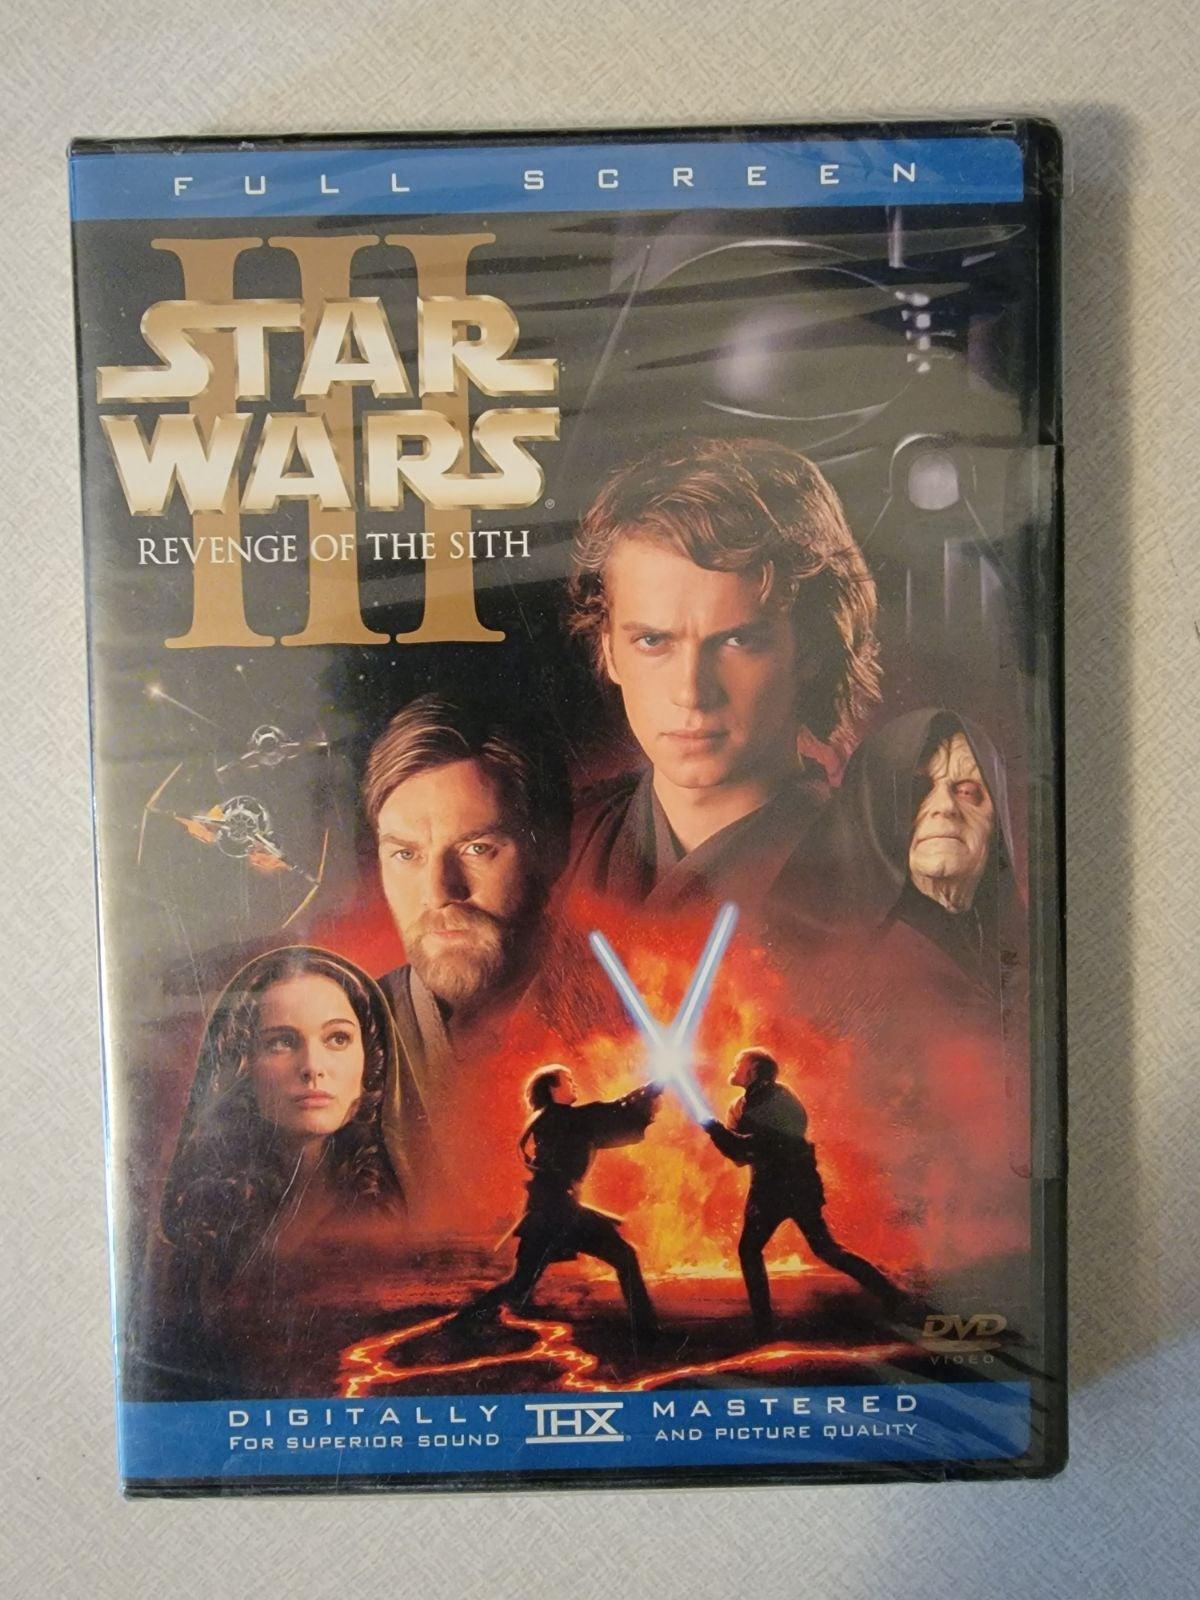 Star Wars Episode III DVD - Brand New